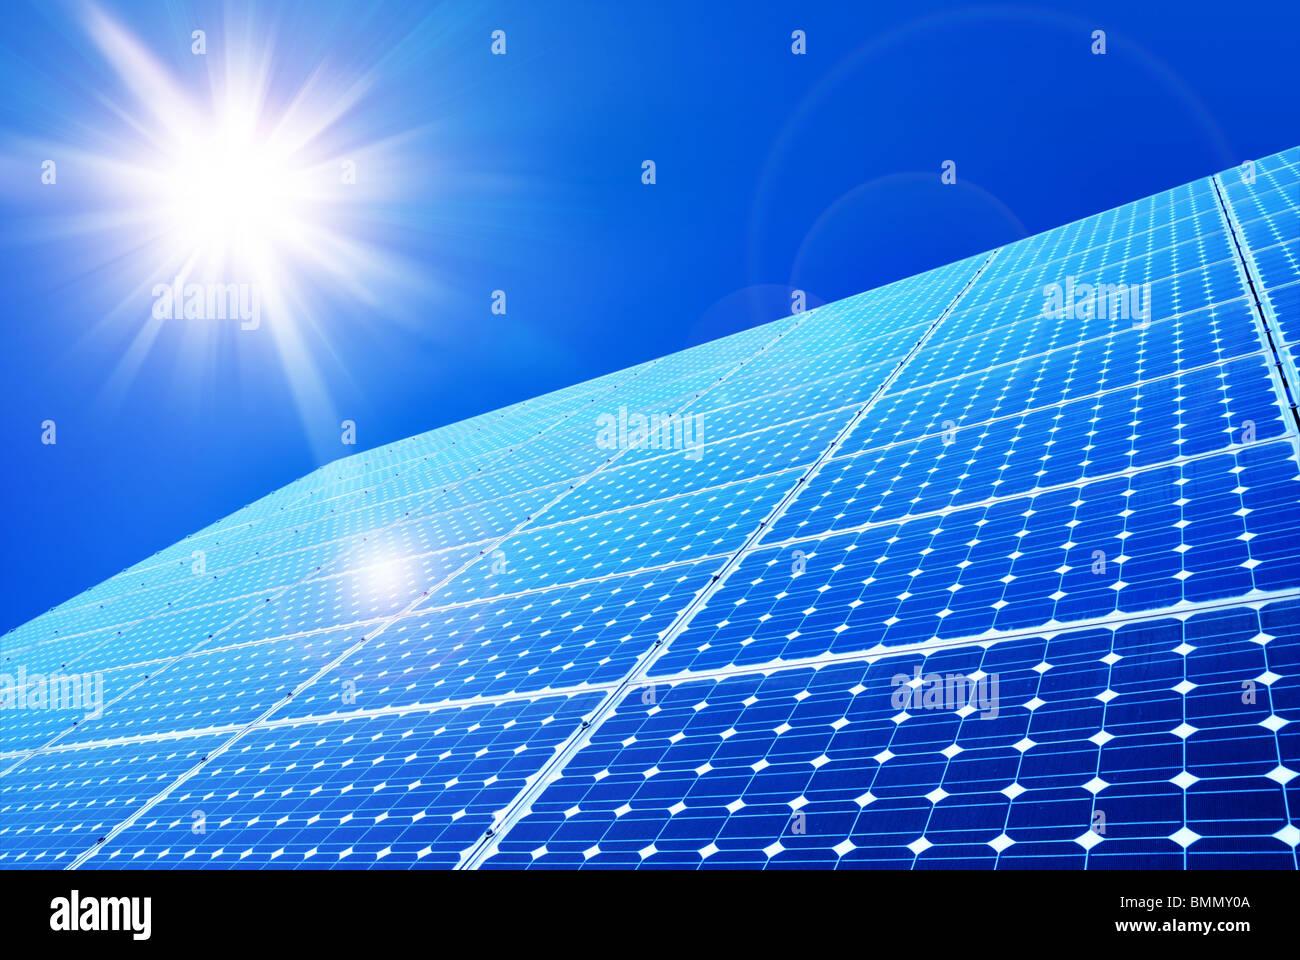 Solar panel against blue sky - Stock Image